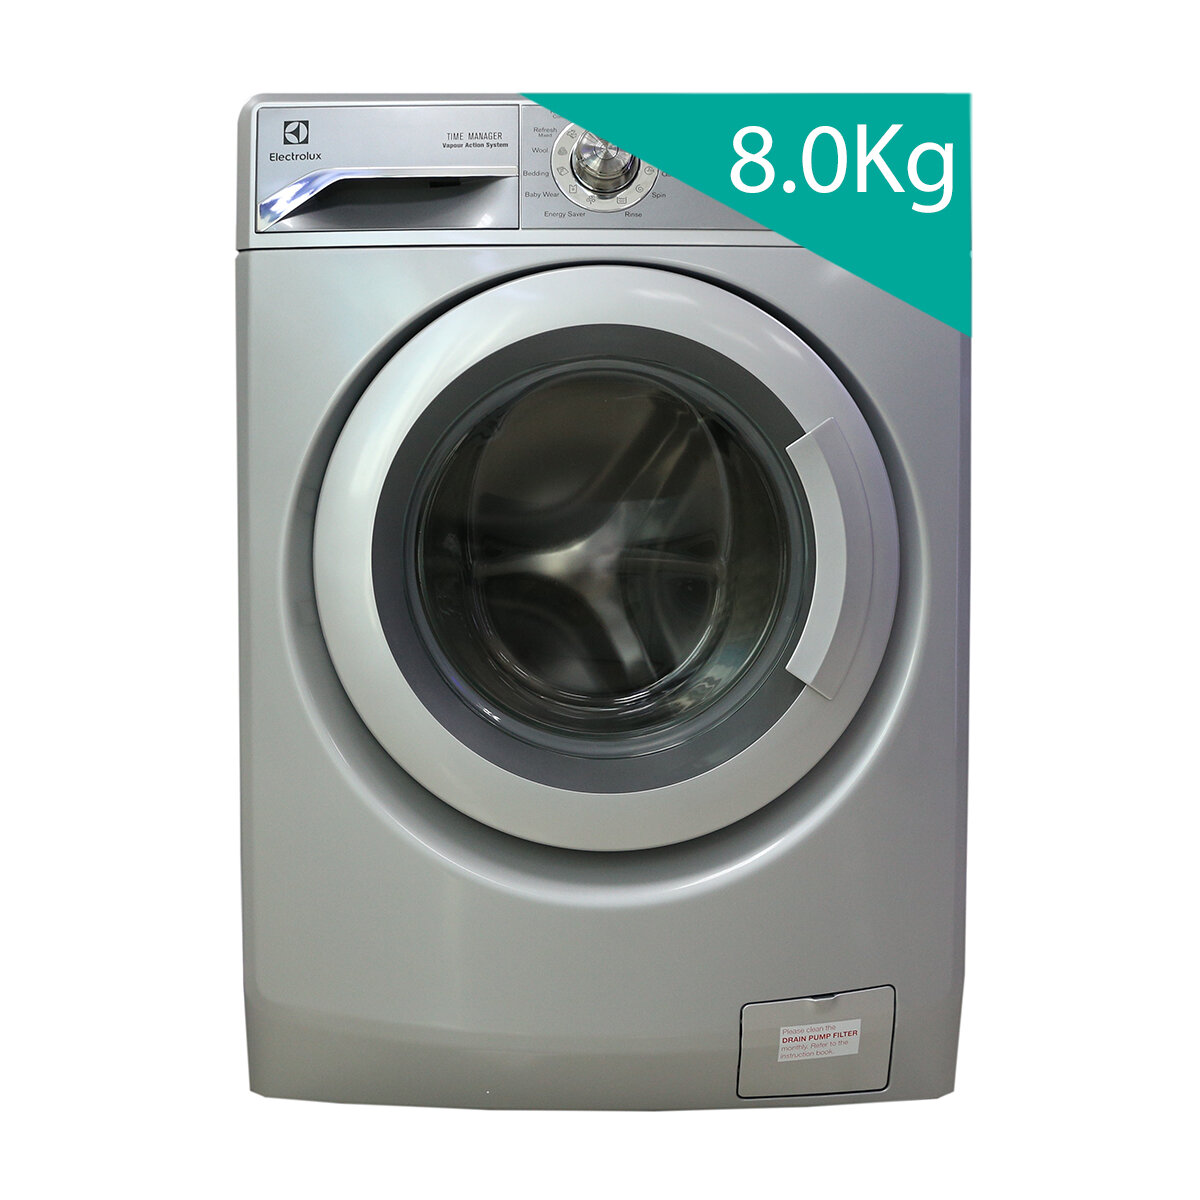 Máy giặt Electrolux 8kg giá bao nhiêu tiền?